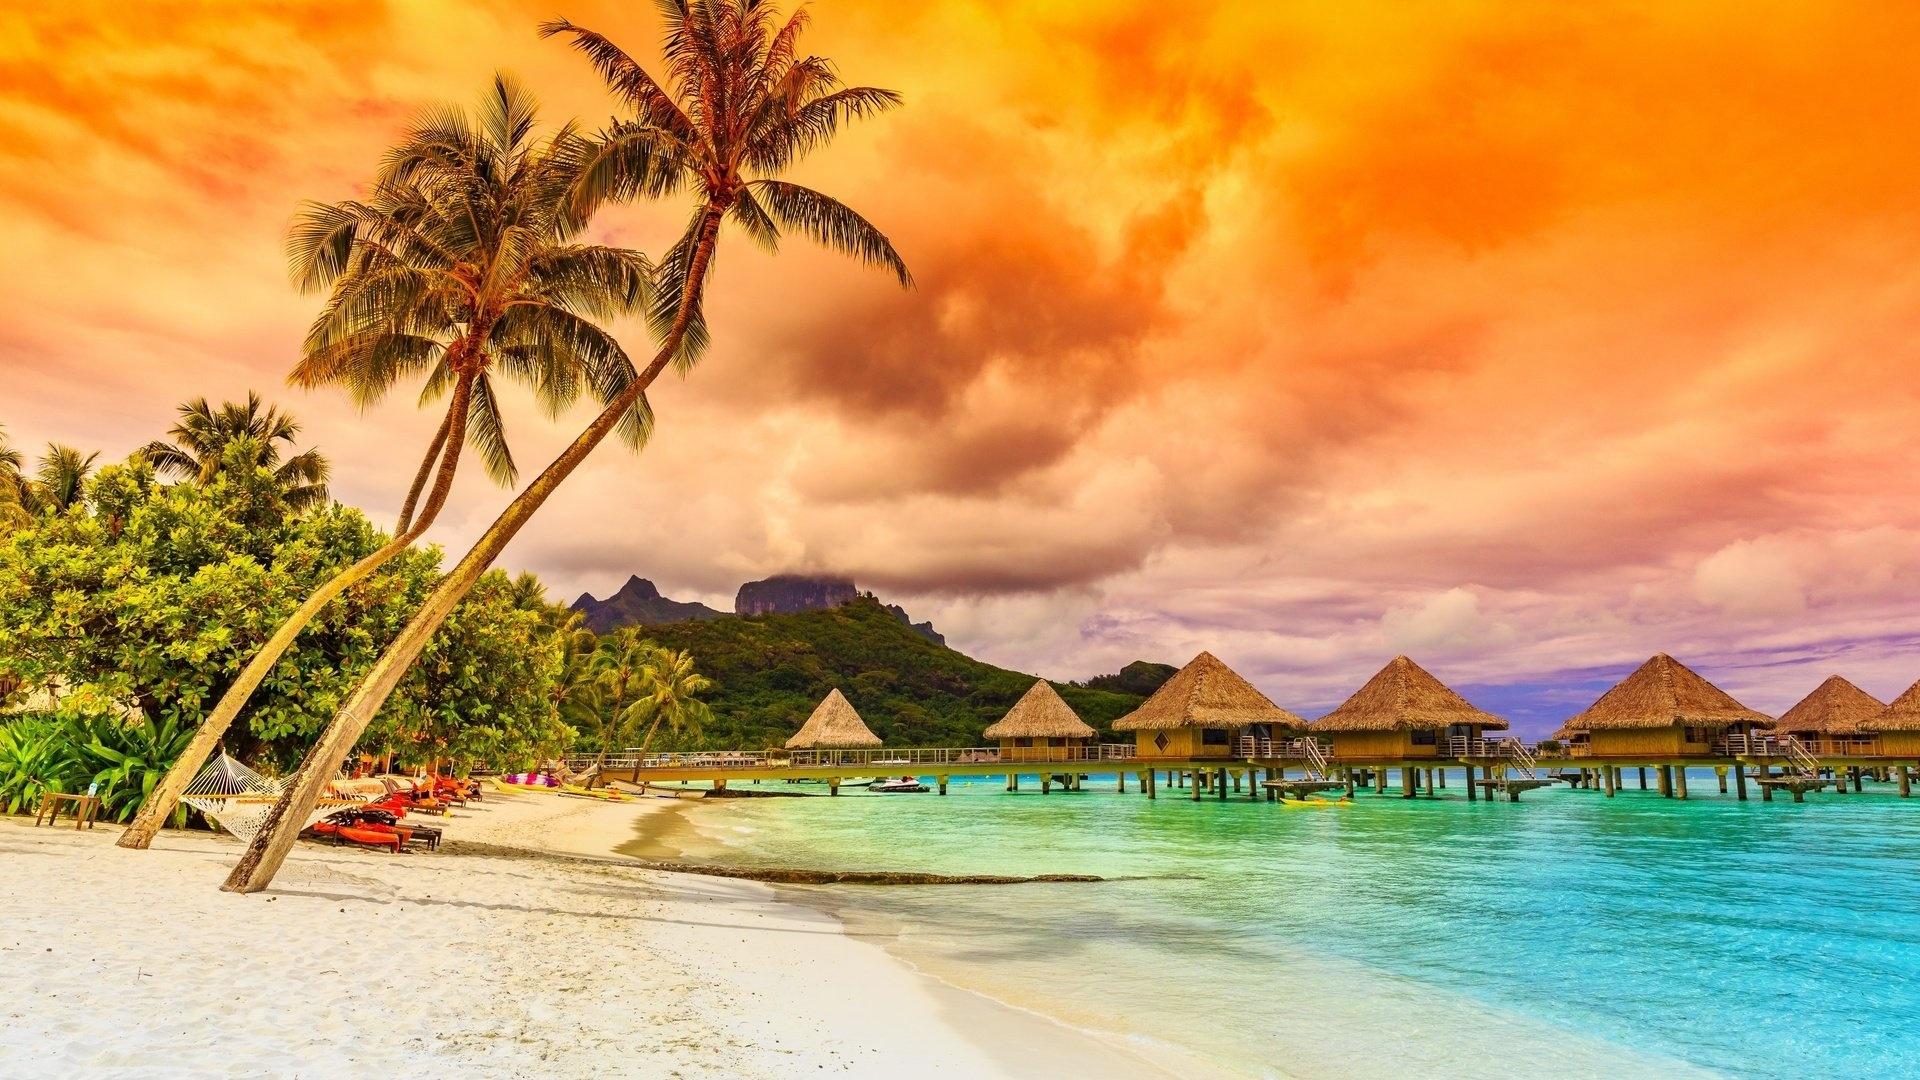 Paradise Download Wallpaper